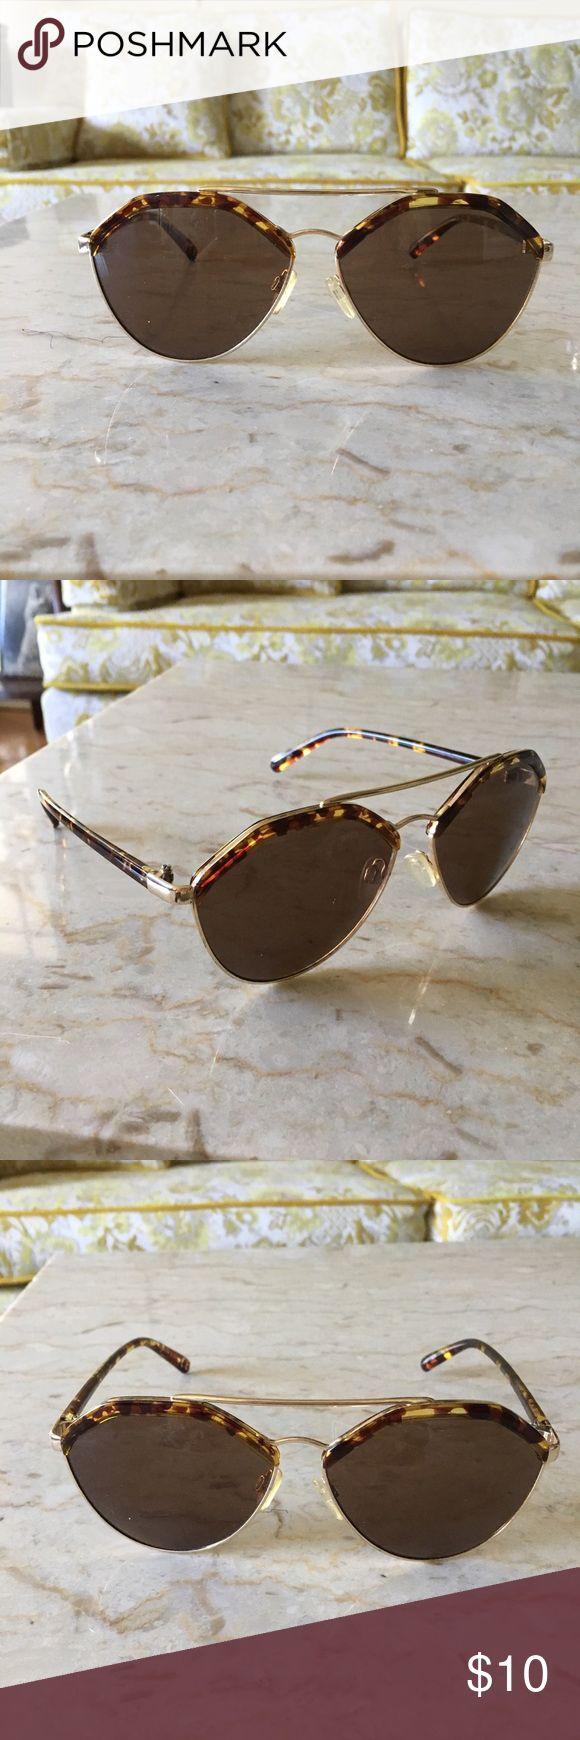 TOPSHOP sunglasses TOPSHOP tortoise sunglasses Topshop Accessories Sunglasses